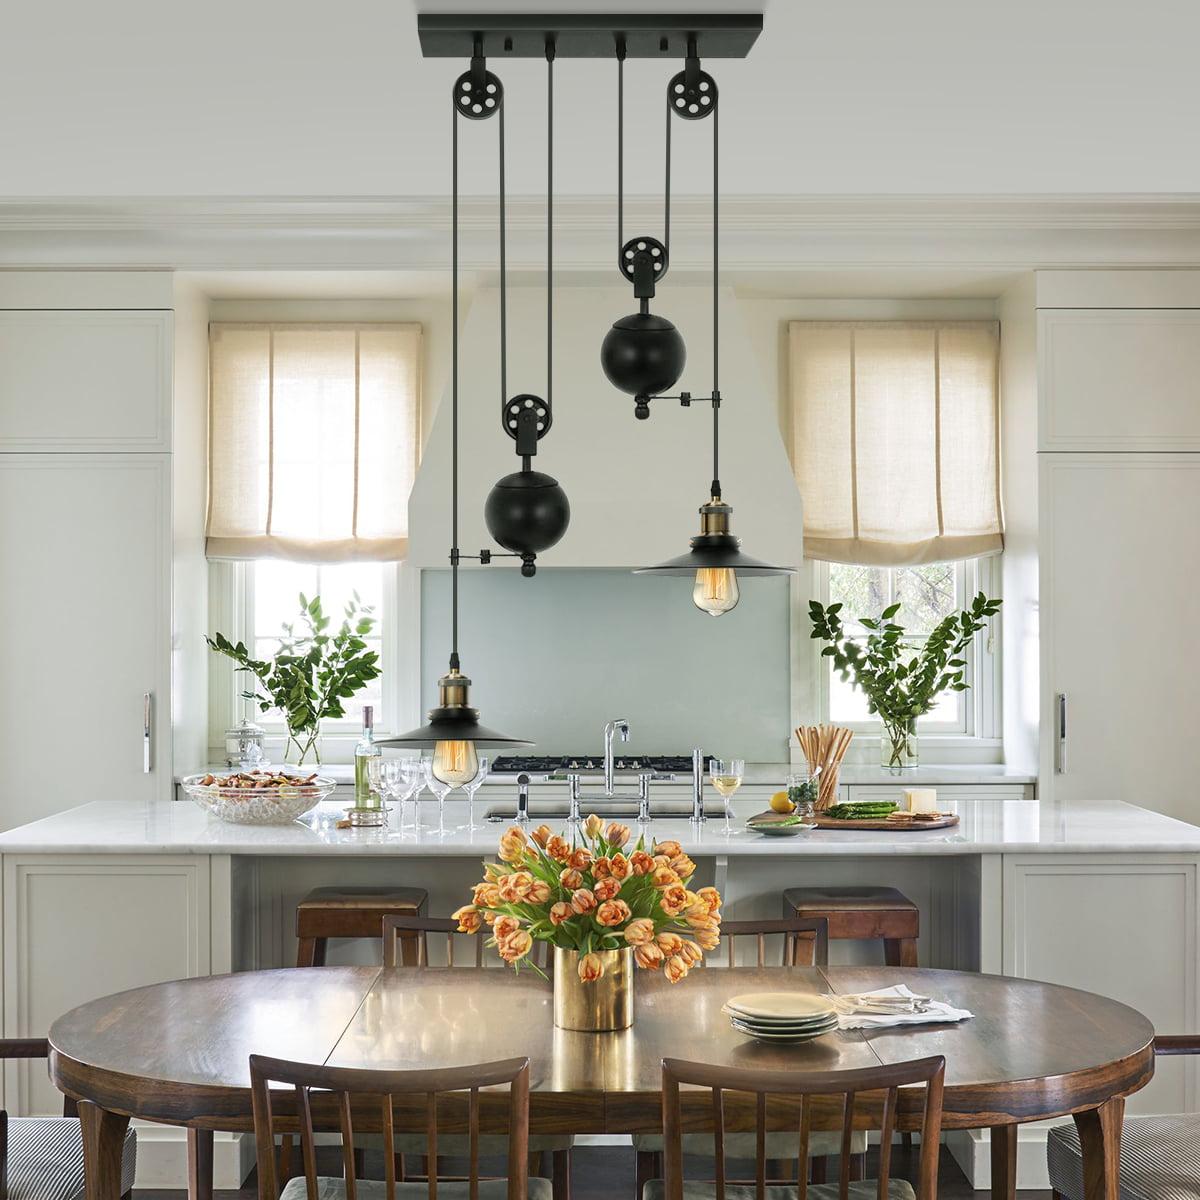 Rustic Dining Room Lighting: Two/Three Light Pulley Pendant Light, Kitchen Island Light